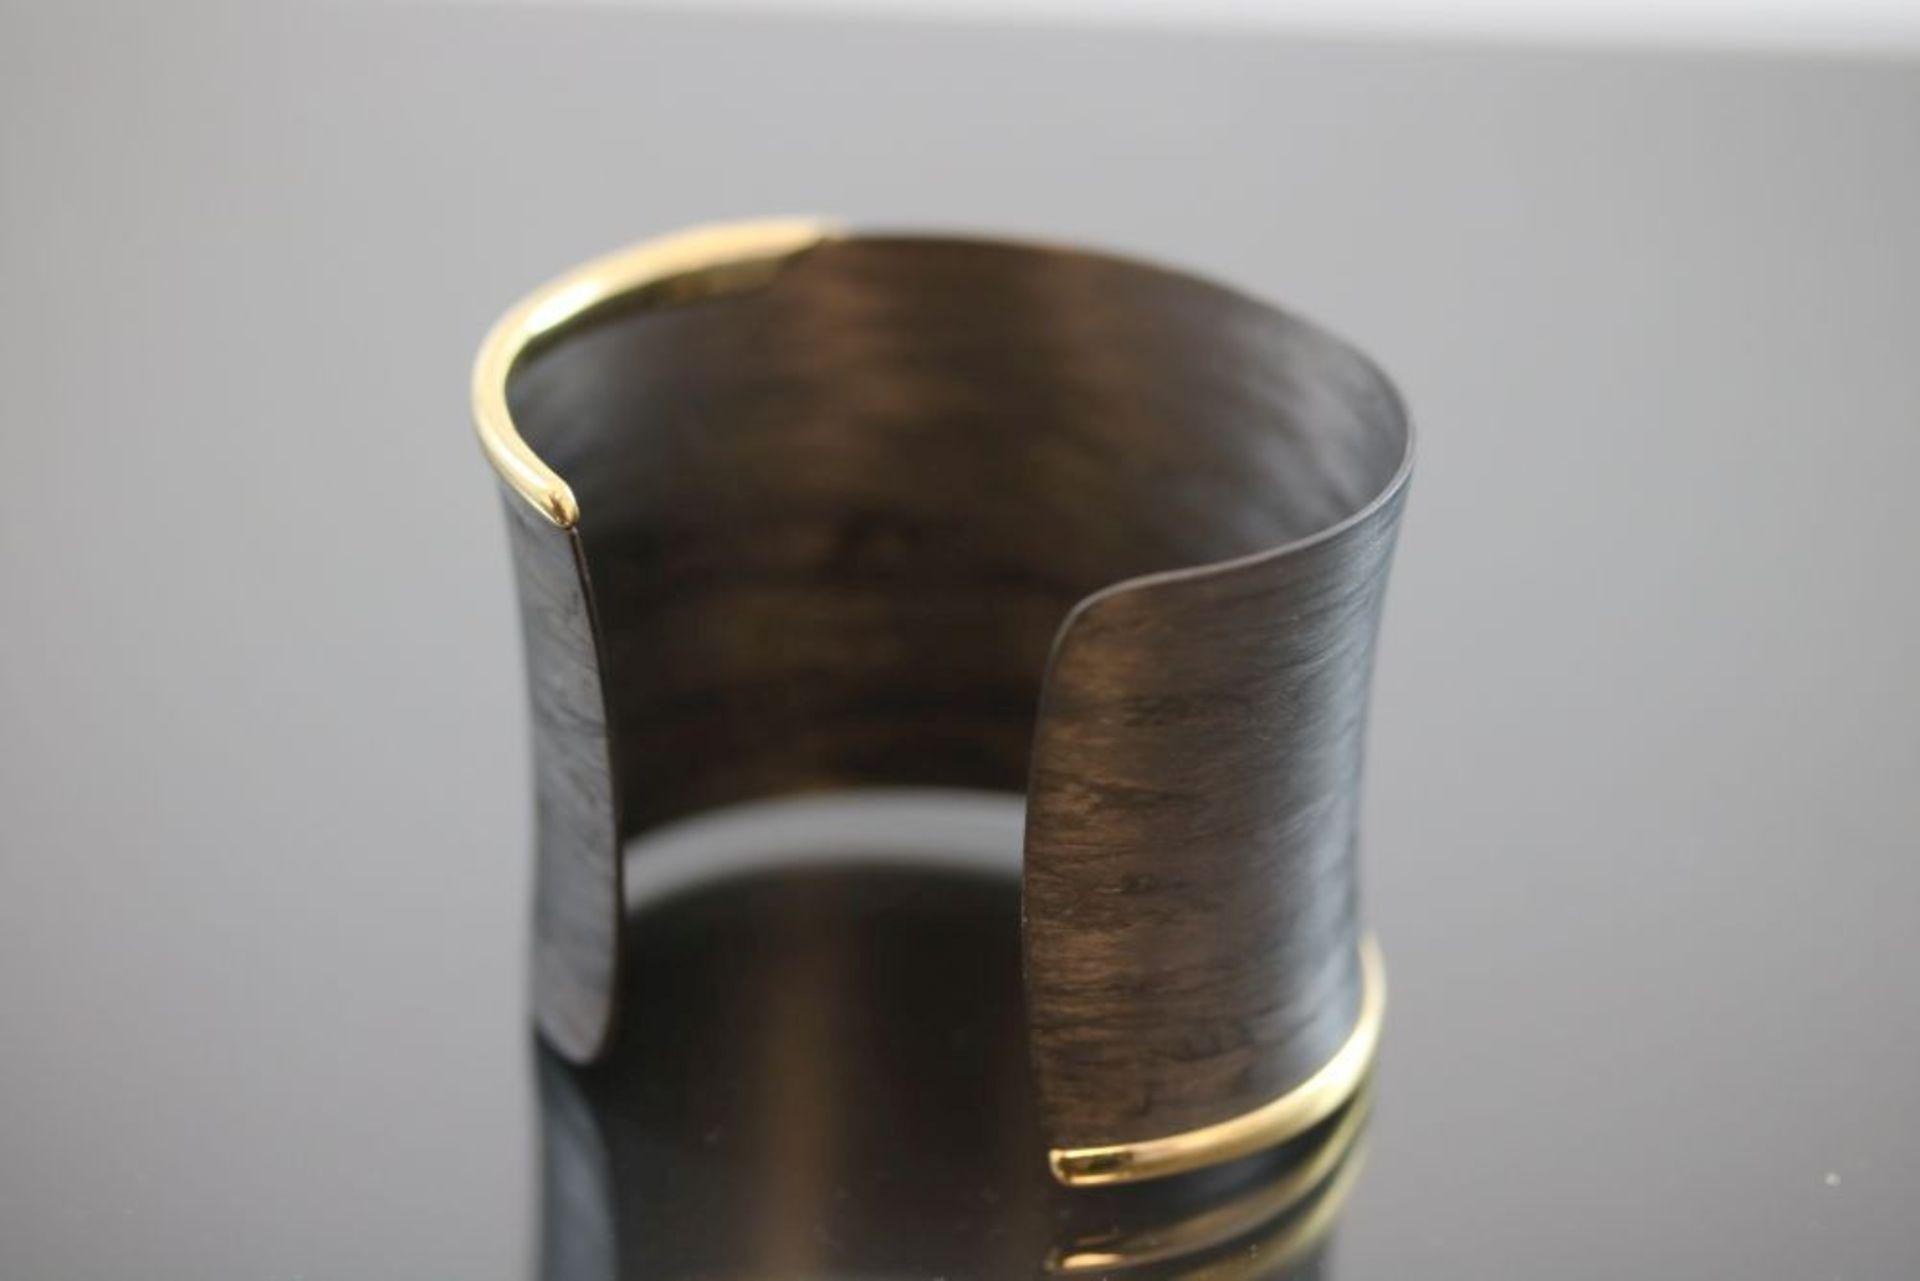 Armreif, Carbon/ Metall vergoldet 17,3 - Image 3 of 3